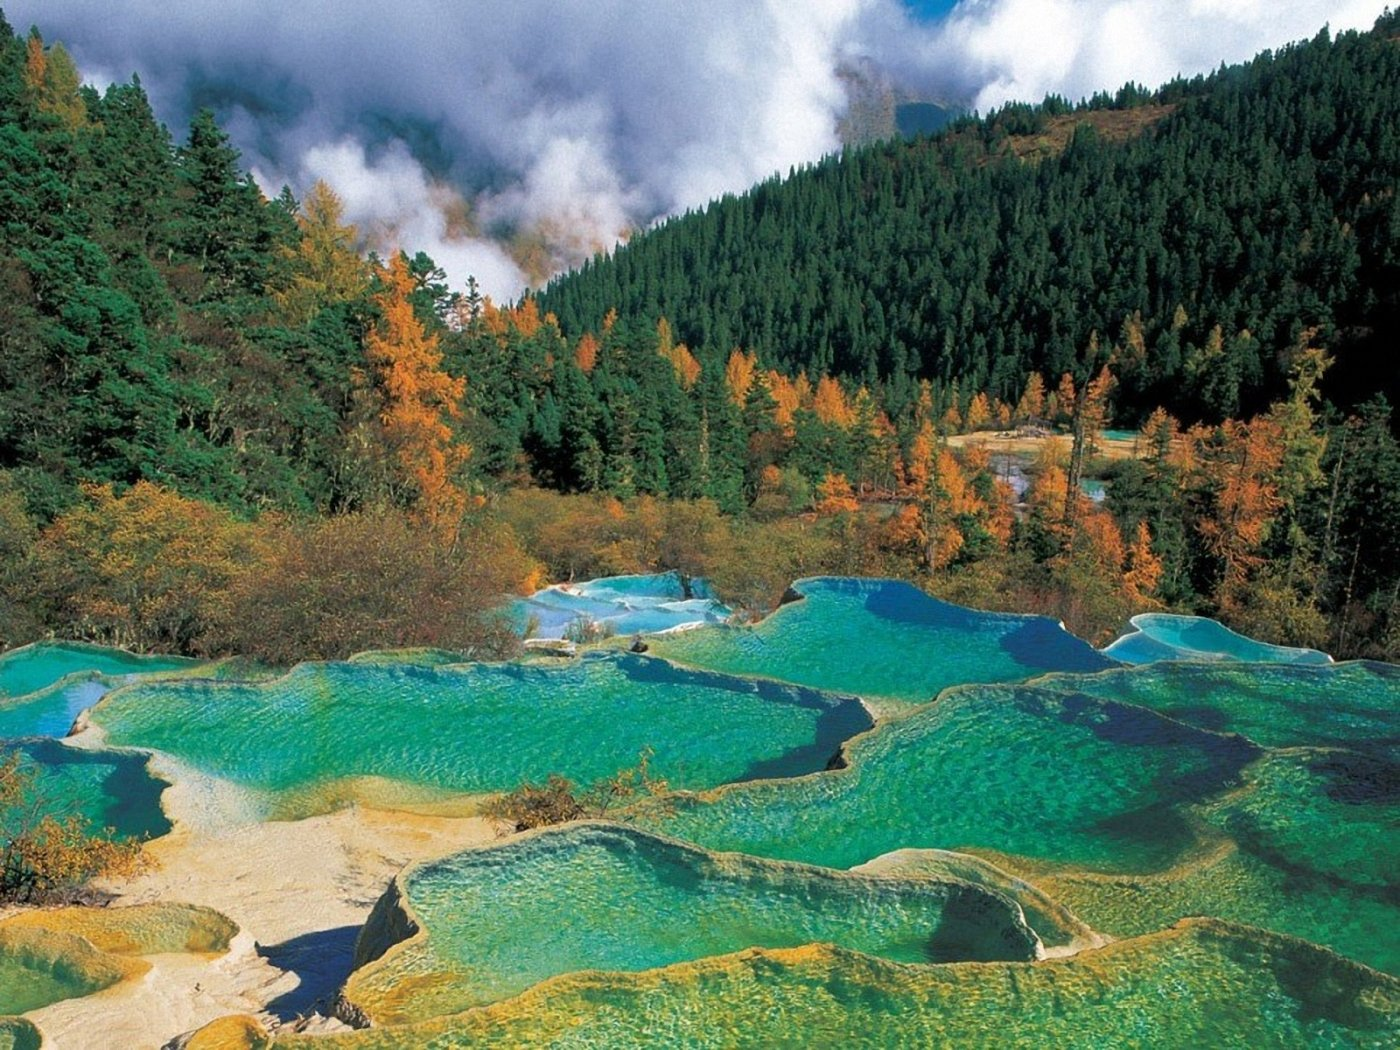 jiuzhaigou-valley-wonderlands-on-the-ear-secret-world